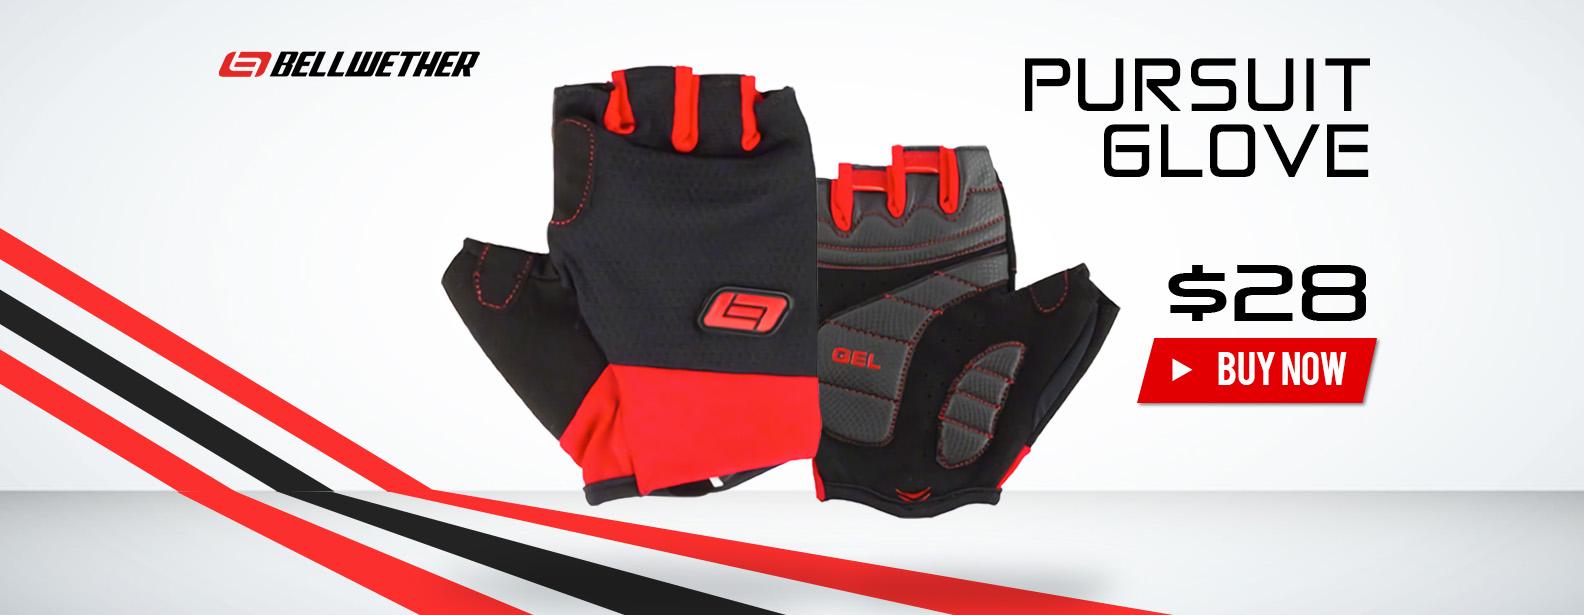 Bellwether Pursuit Glove